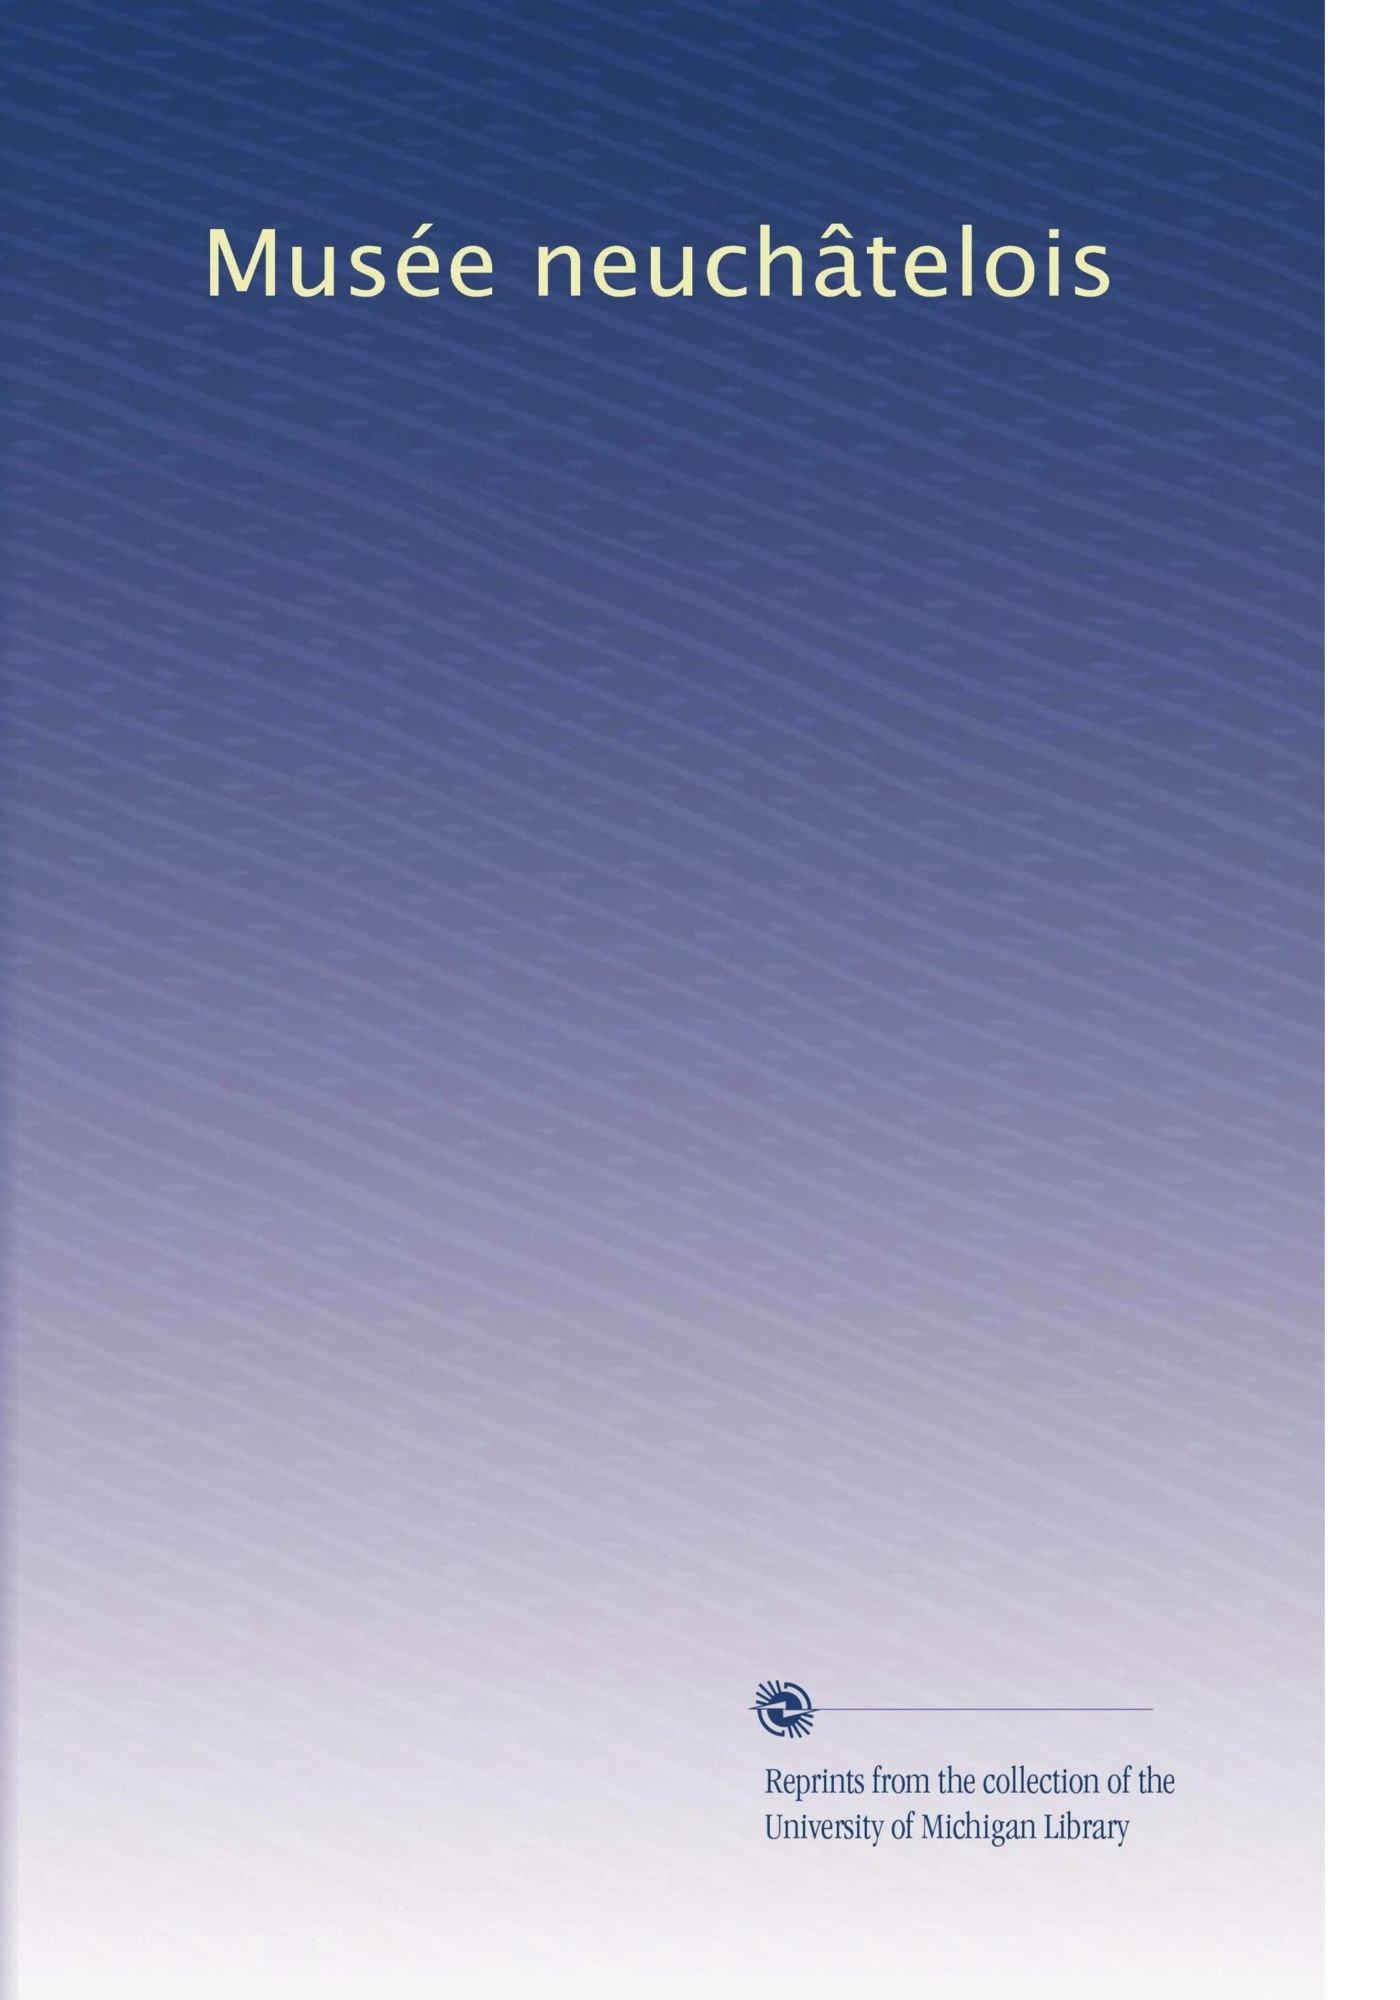 Musée neuchâtelois (Volume 39) (French Edition) ebook